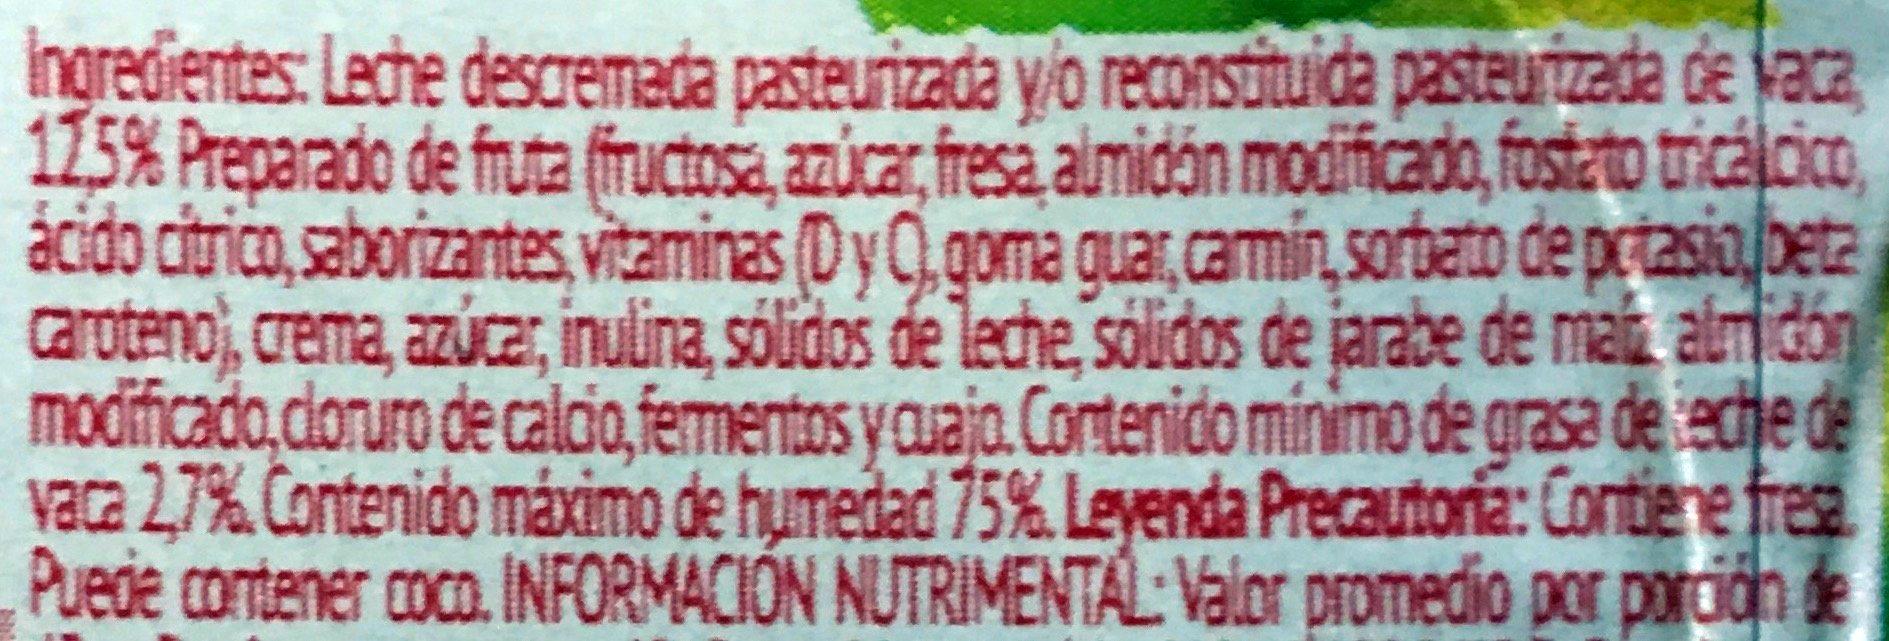 Danonino 12 pck - Ingredients - es